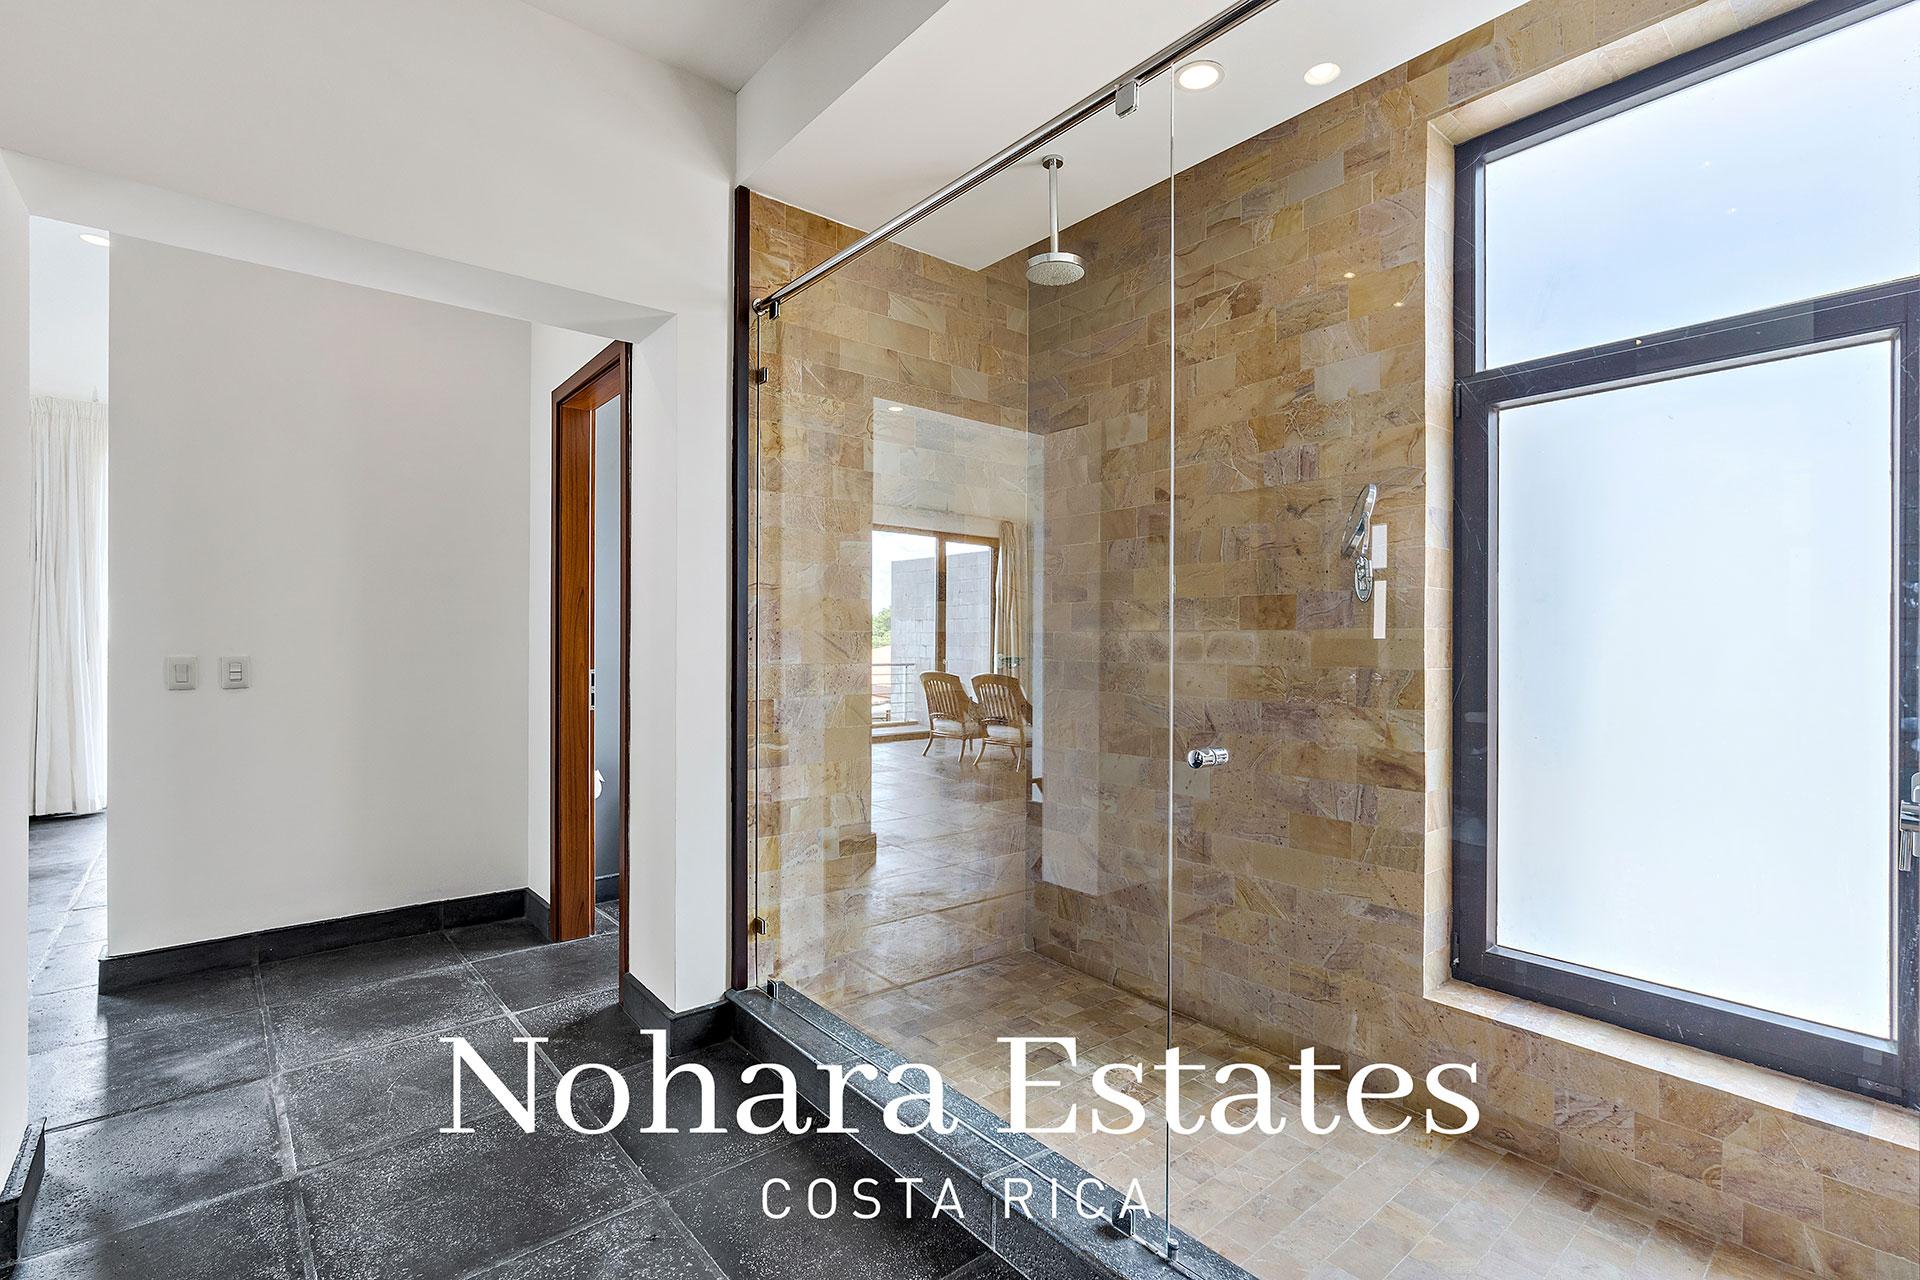 Nohara Estates Costa Rica 128 Penthouse Quepos Los Altos 15